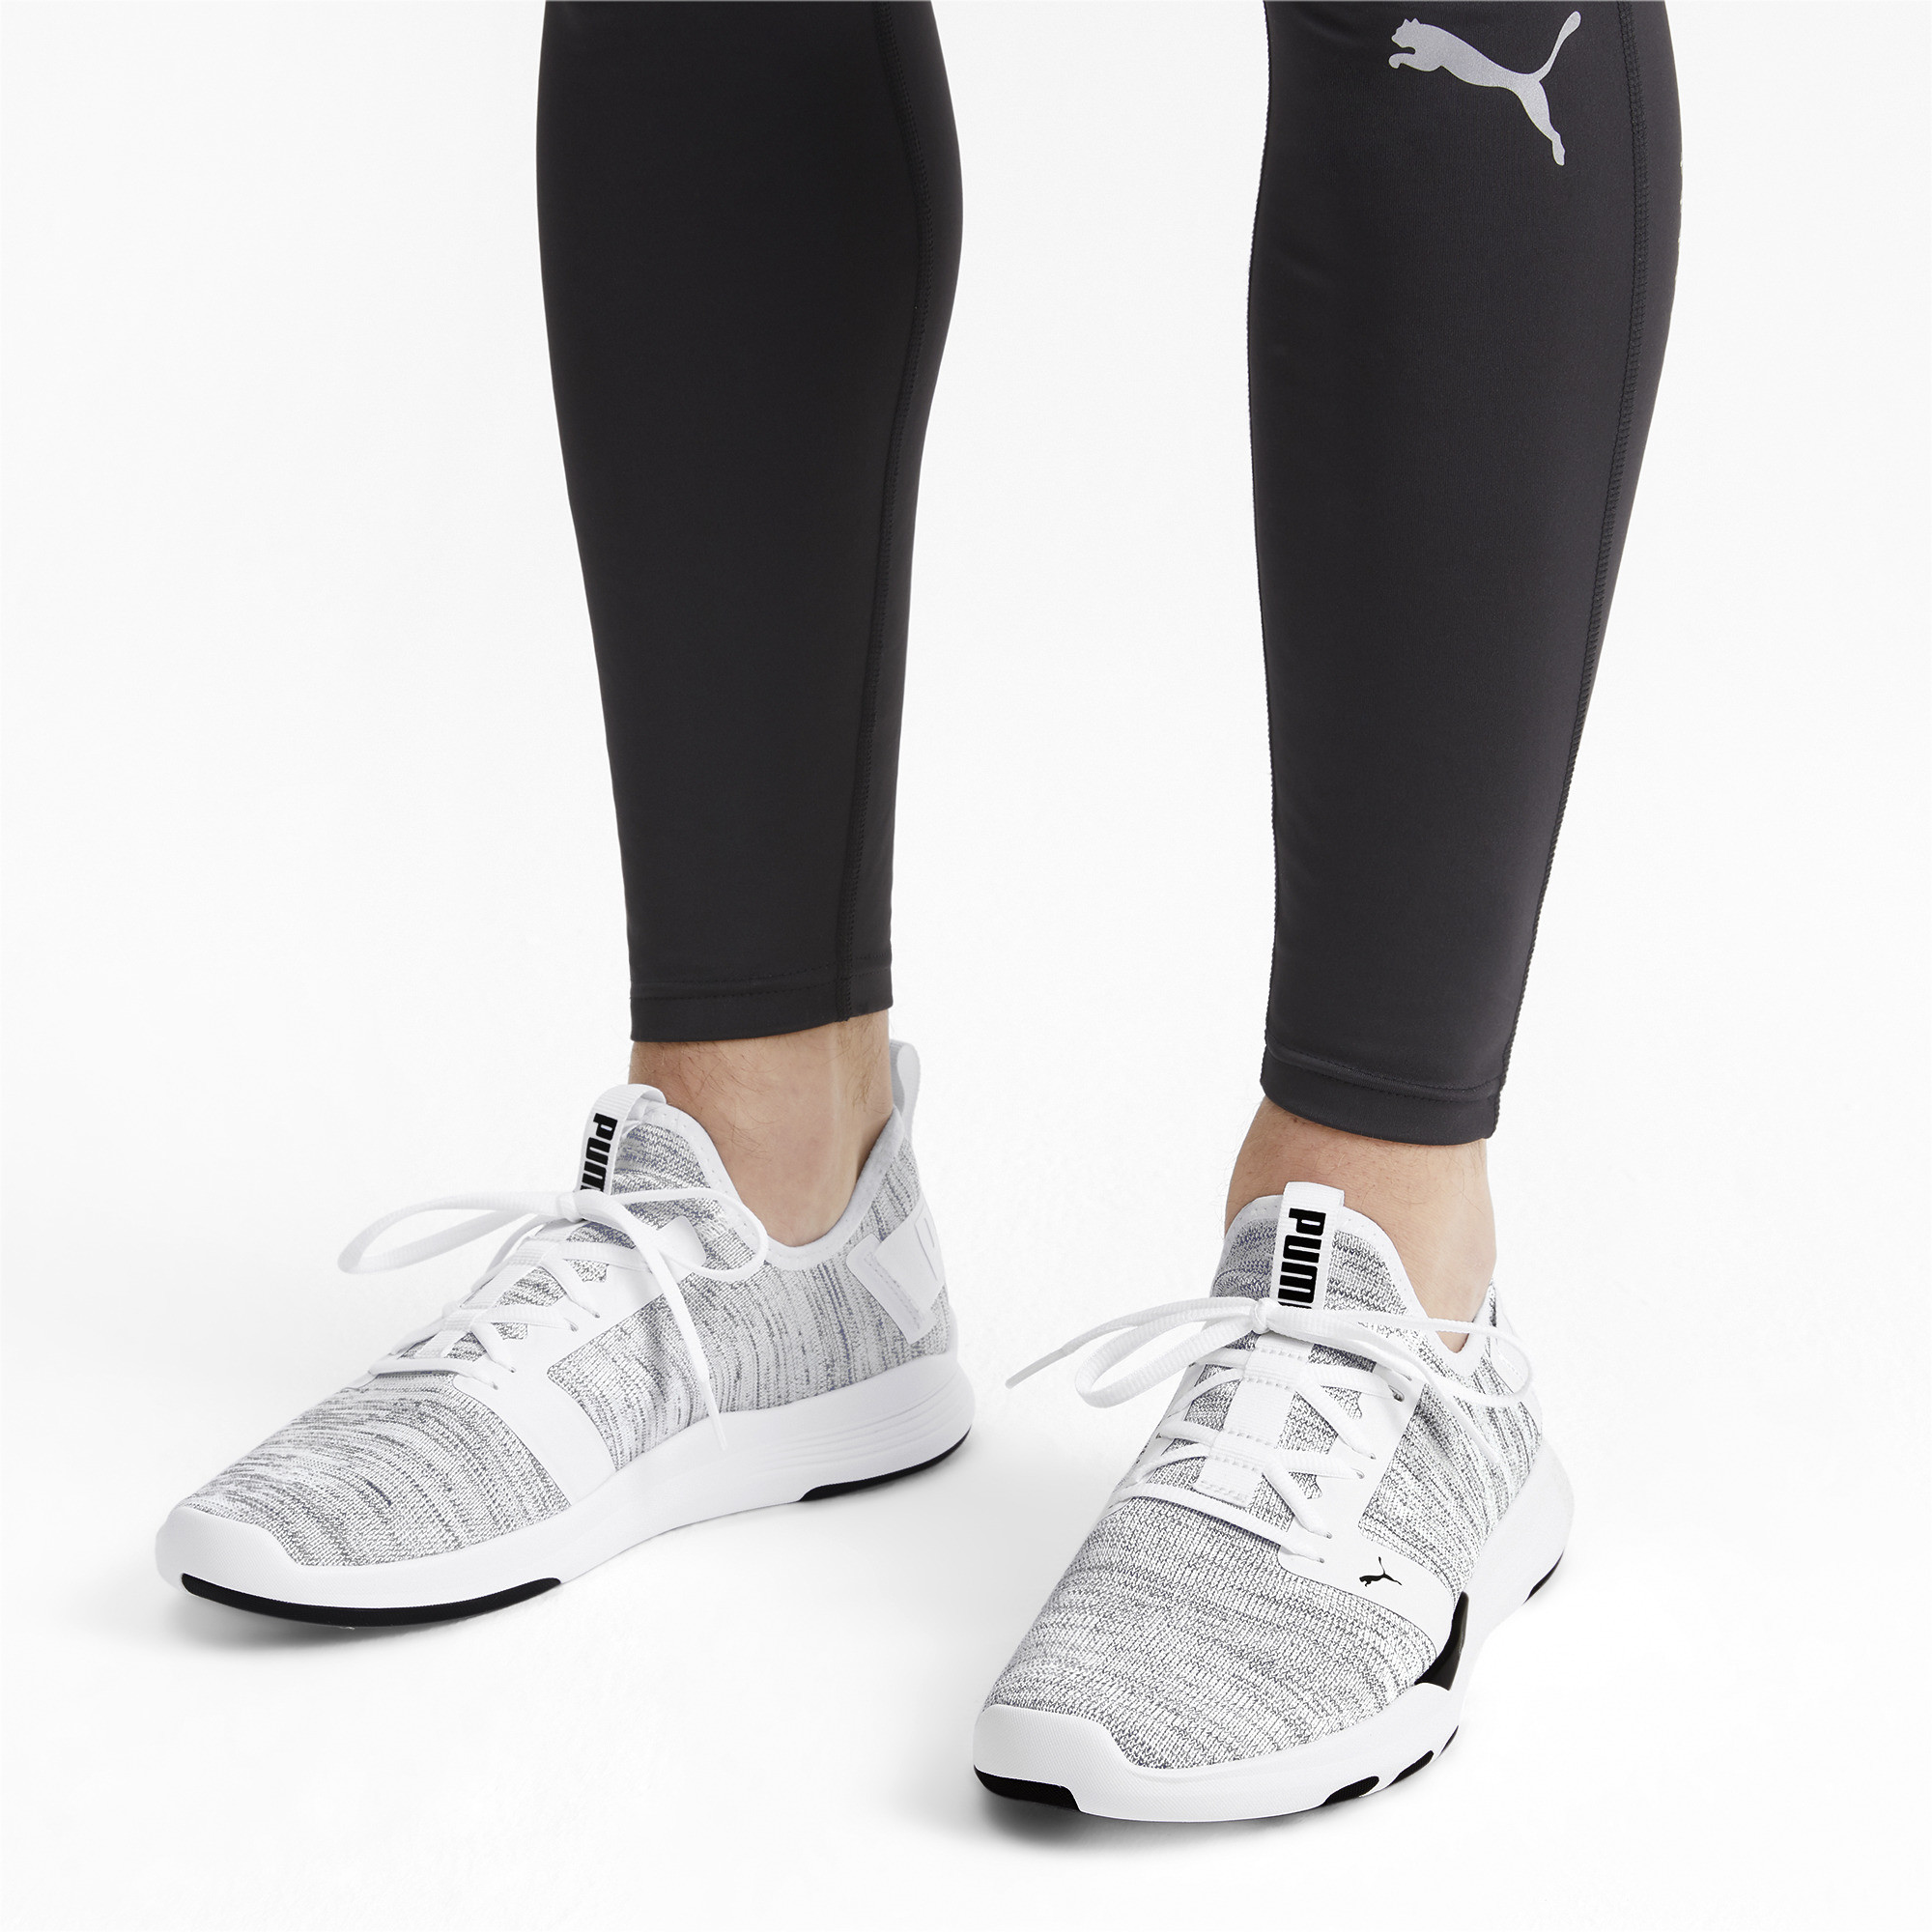 PUMA-Men-039-s-IGNITE-Contender-Knit-Running-Shoes thumbnail 22